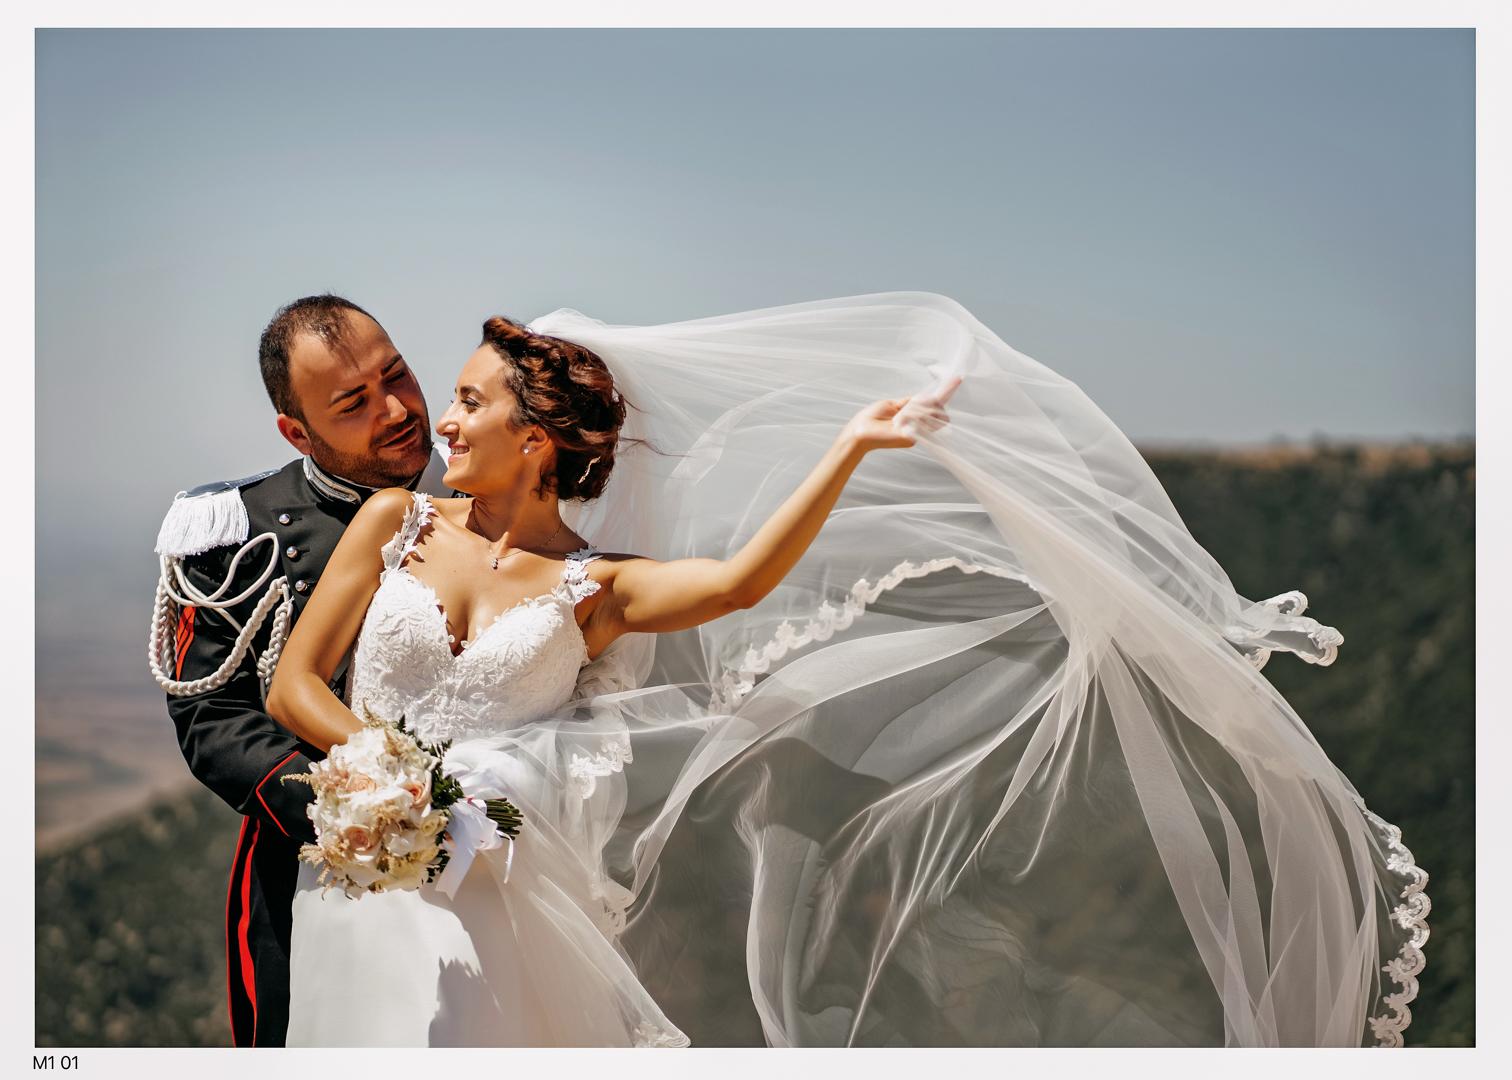 1 gianni-lepore-matrimonio-rignano-ripa